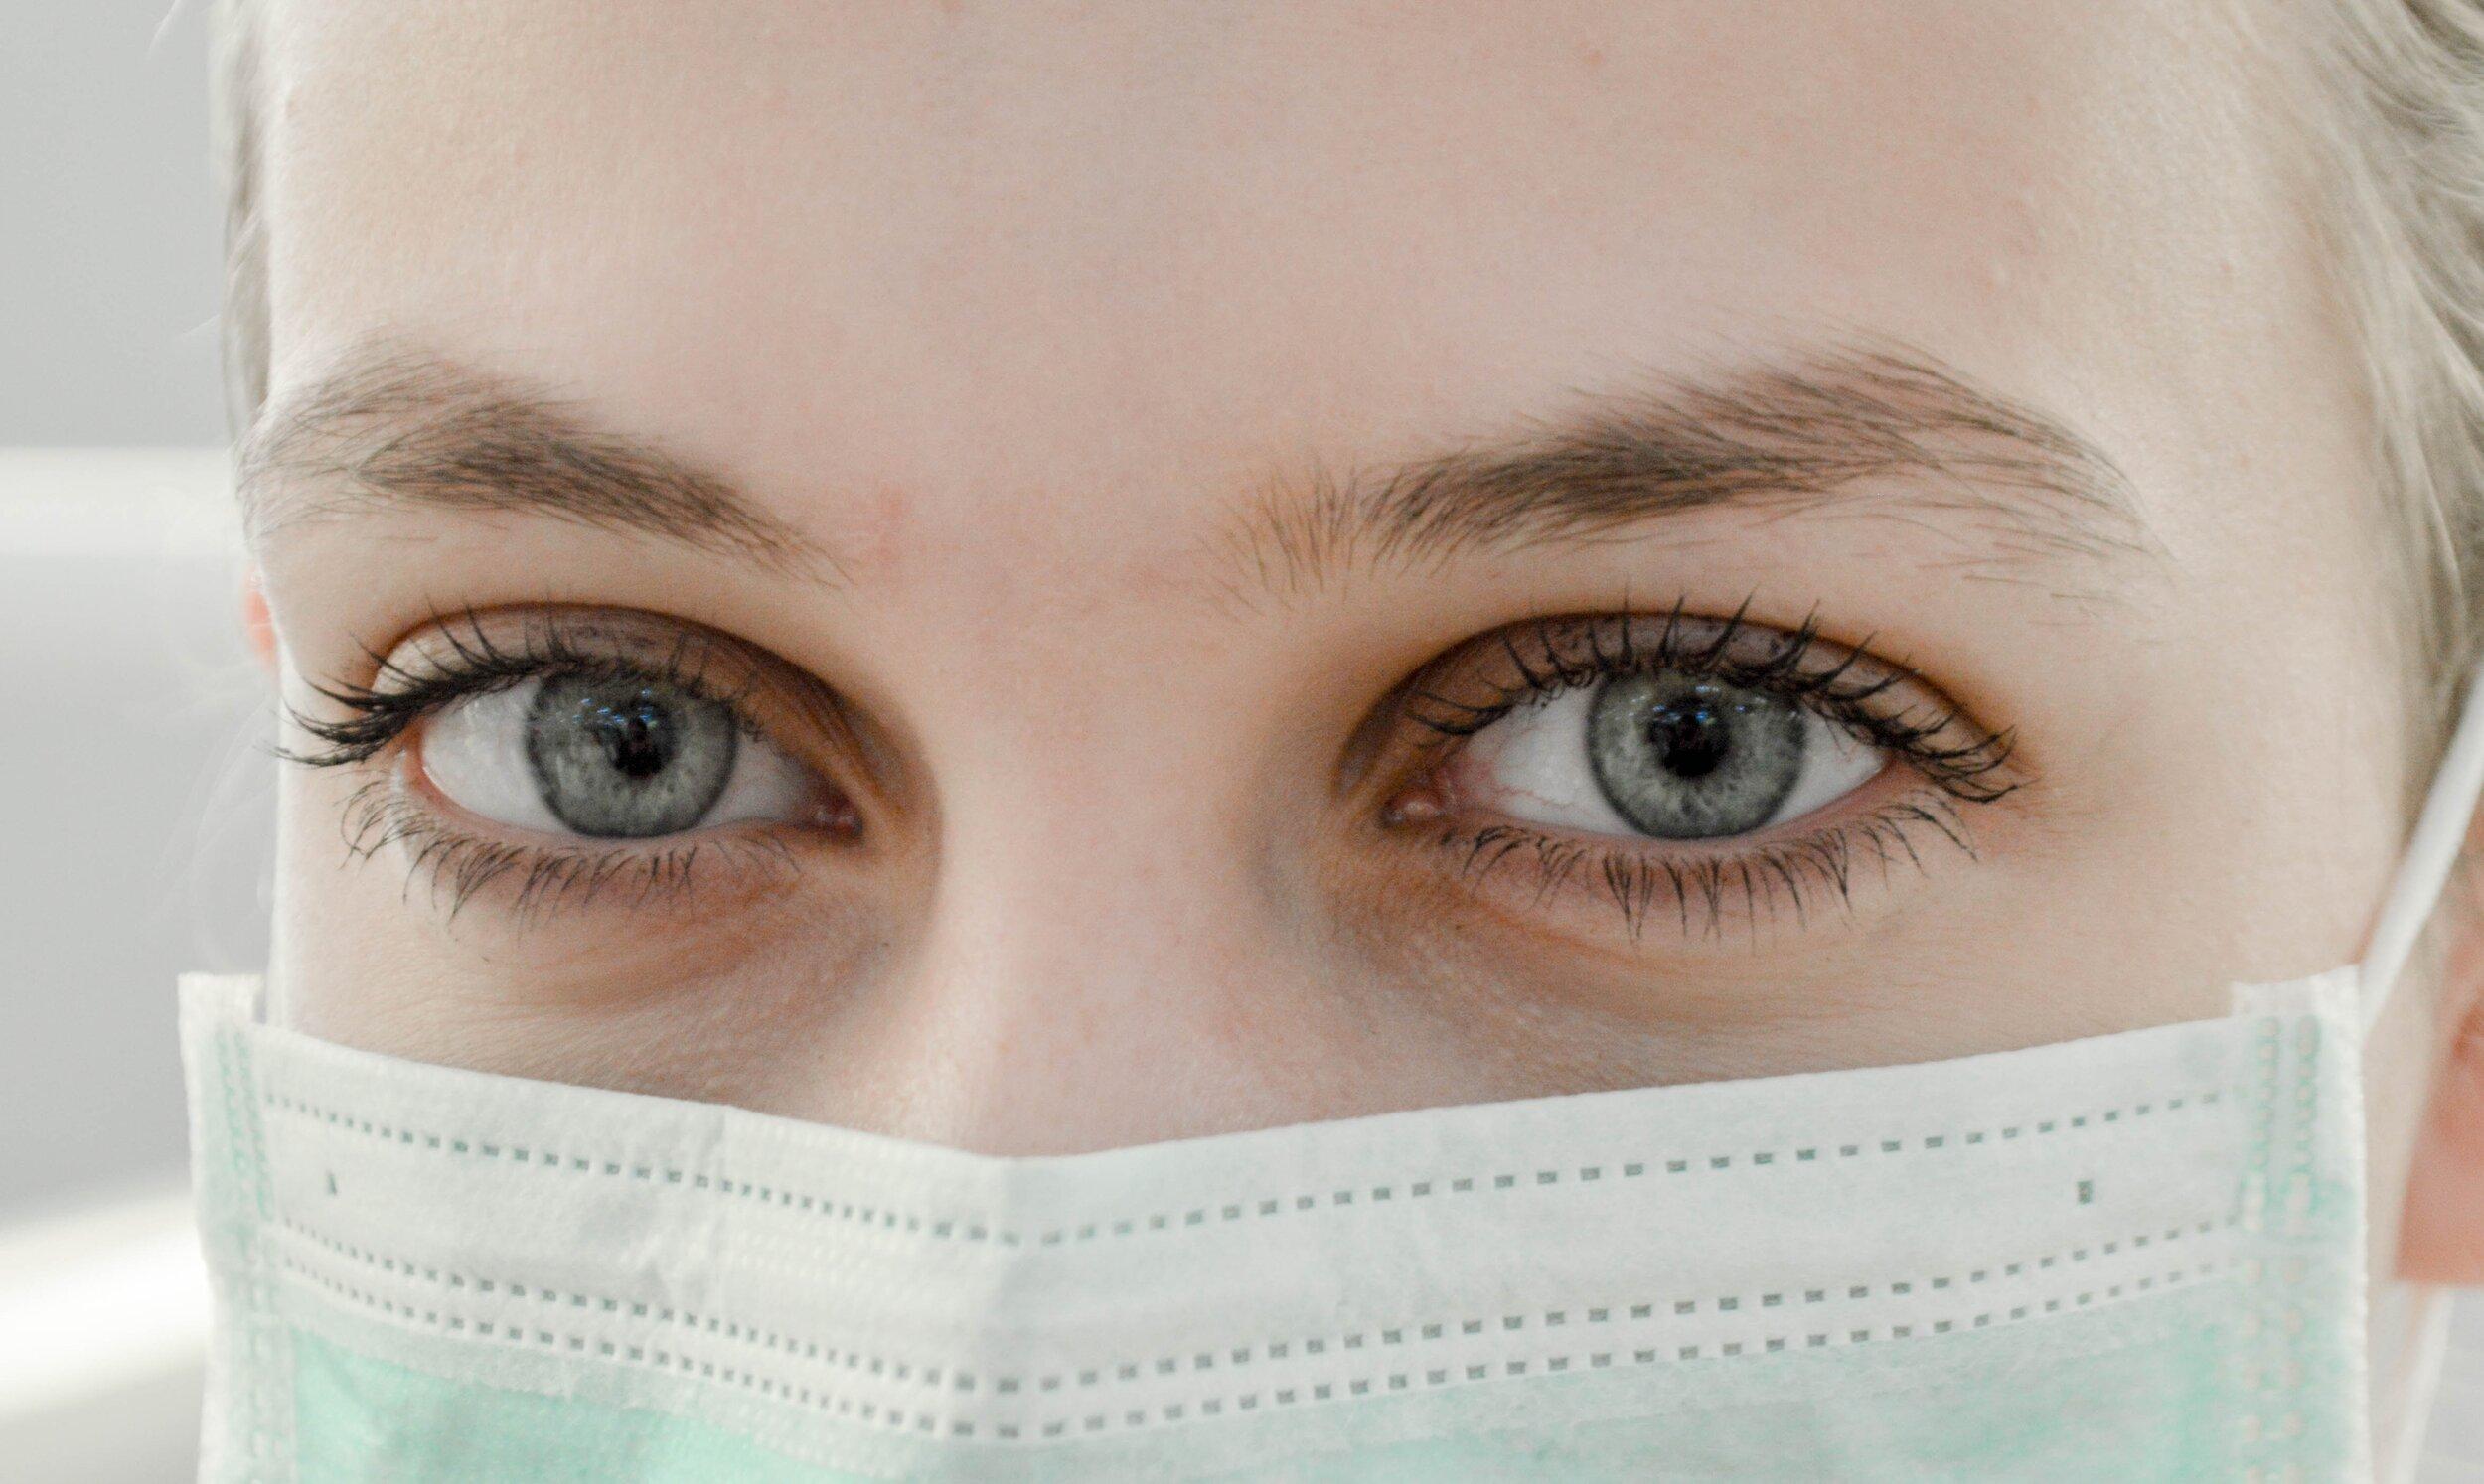 Treating GERD, Gastritis, and Acid Reflux Naturally   The Gut Healing Ninja